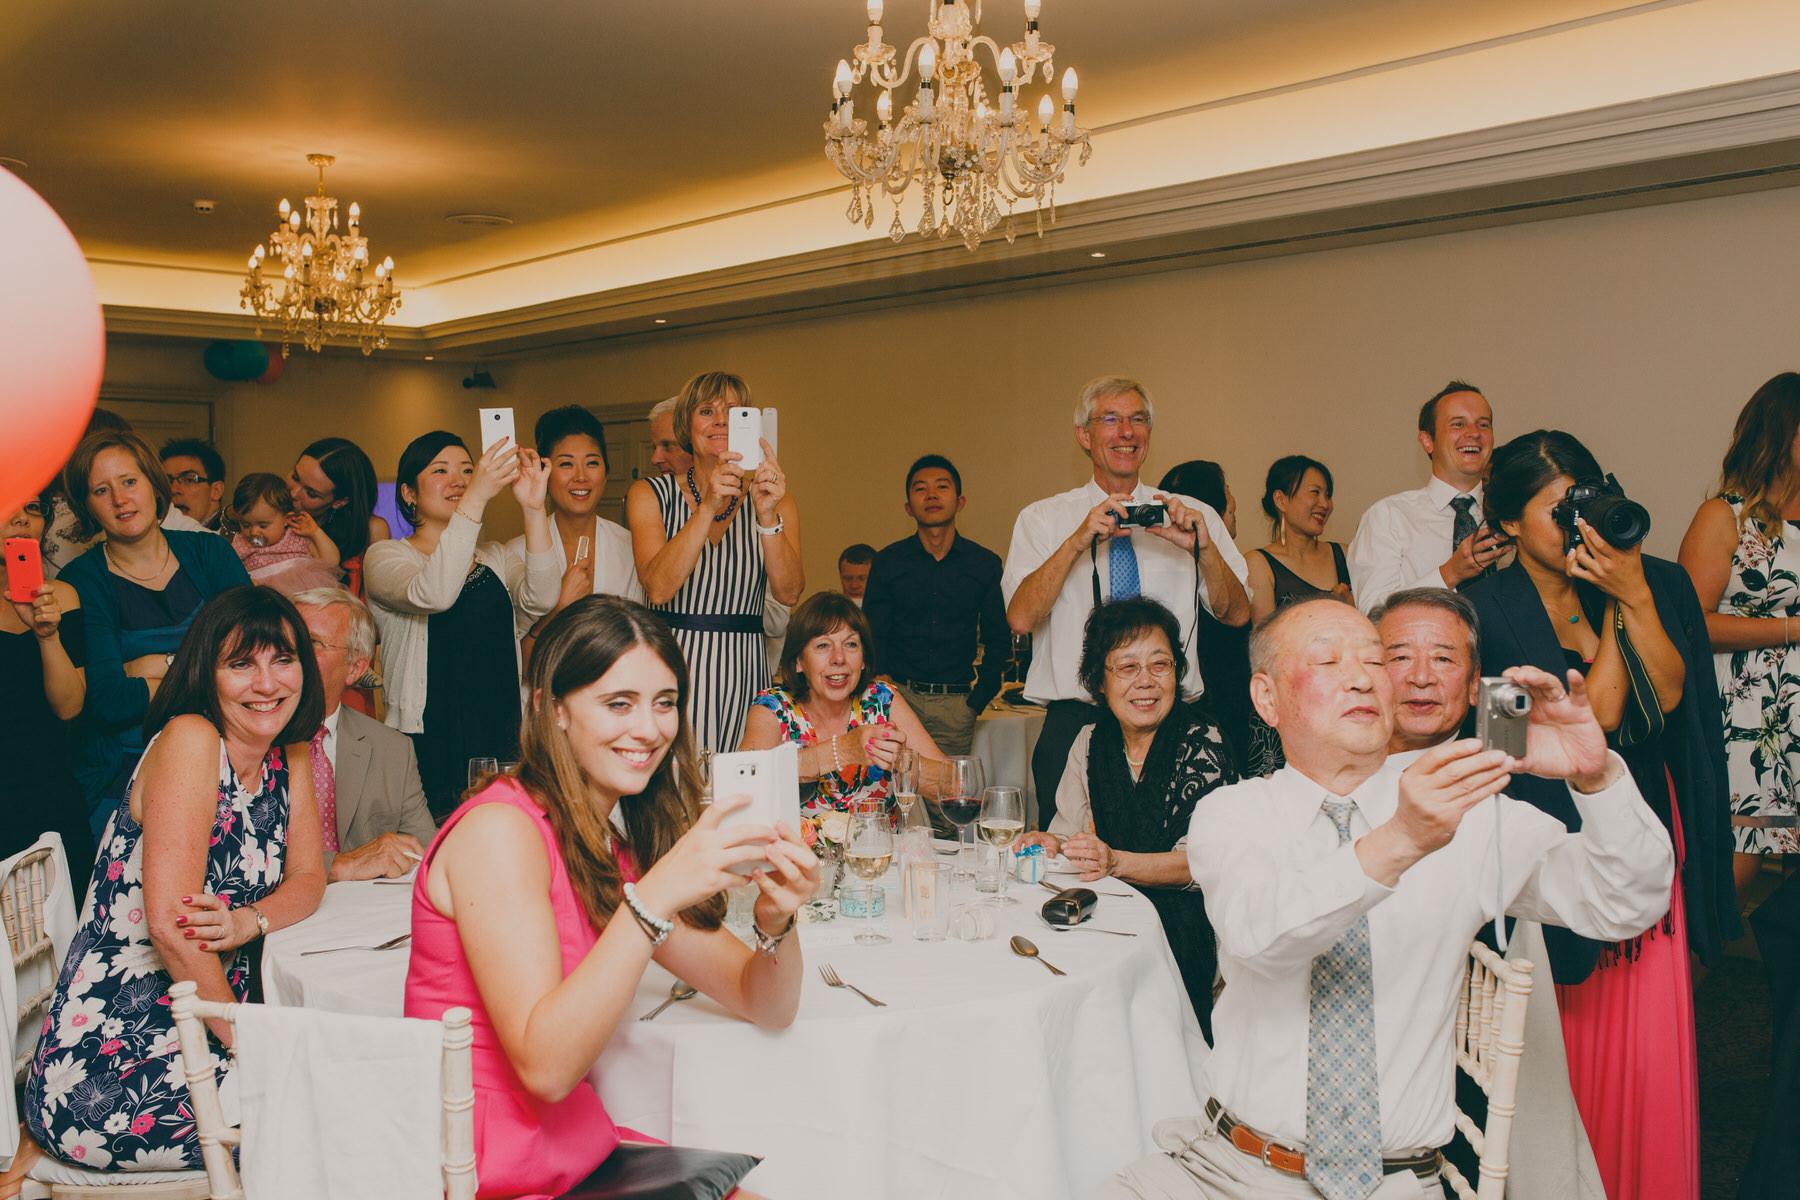 586 guests taking photos cutting of cake Surrey wedding photographer.jpg